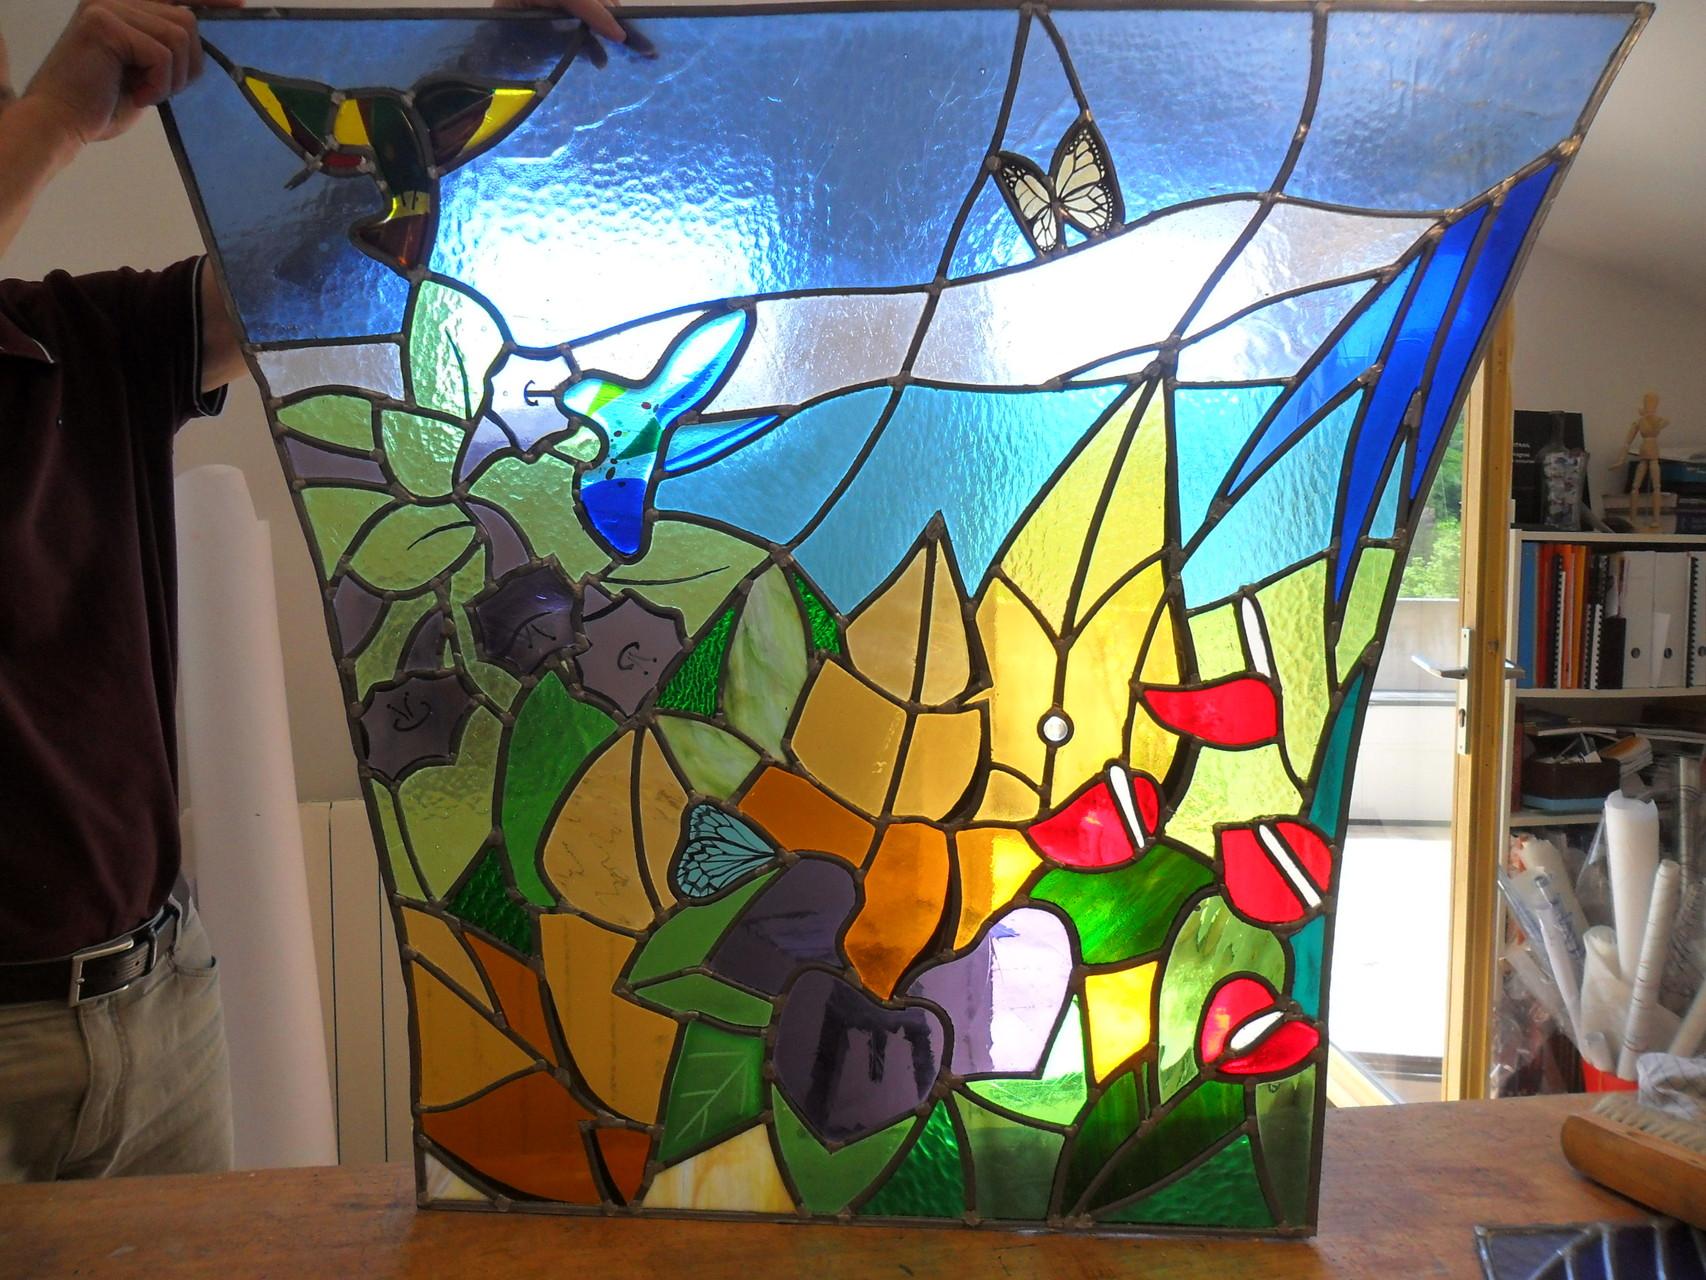 vitrail Jungle triptyque 2 - Art du vitrail - Puimisson 34